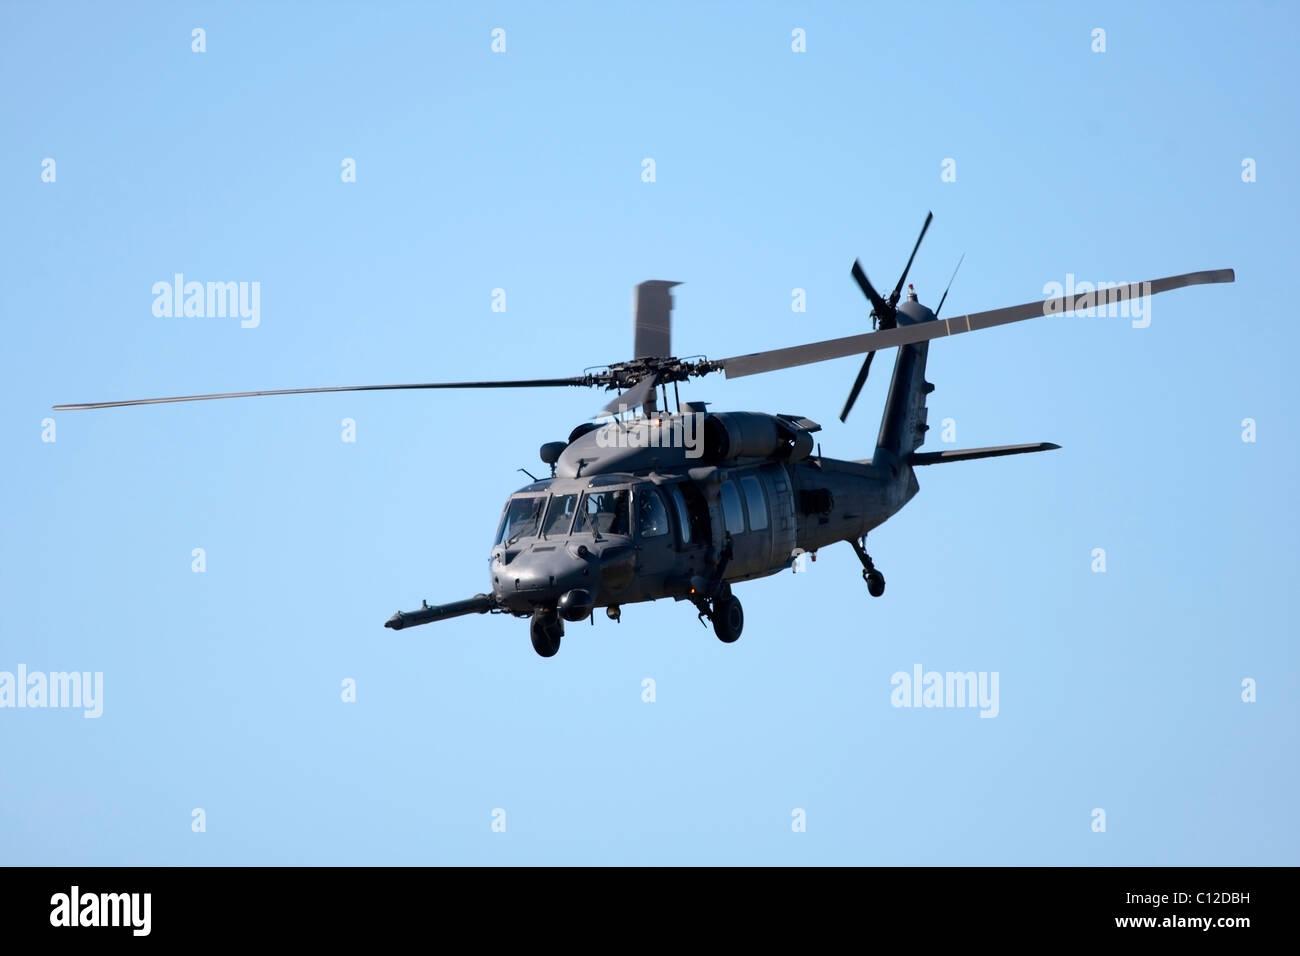 Militärhubschrauber Air zeigen in Cape Town, South Africa, September 2010 Stockbild